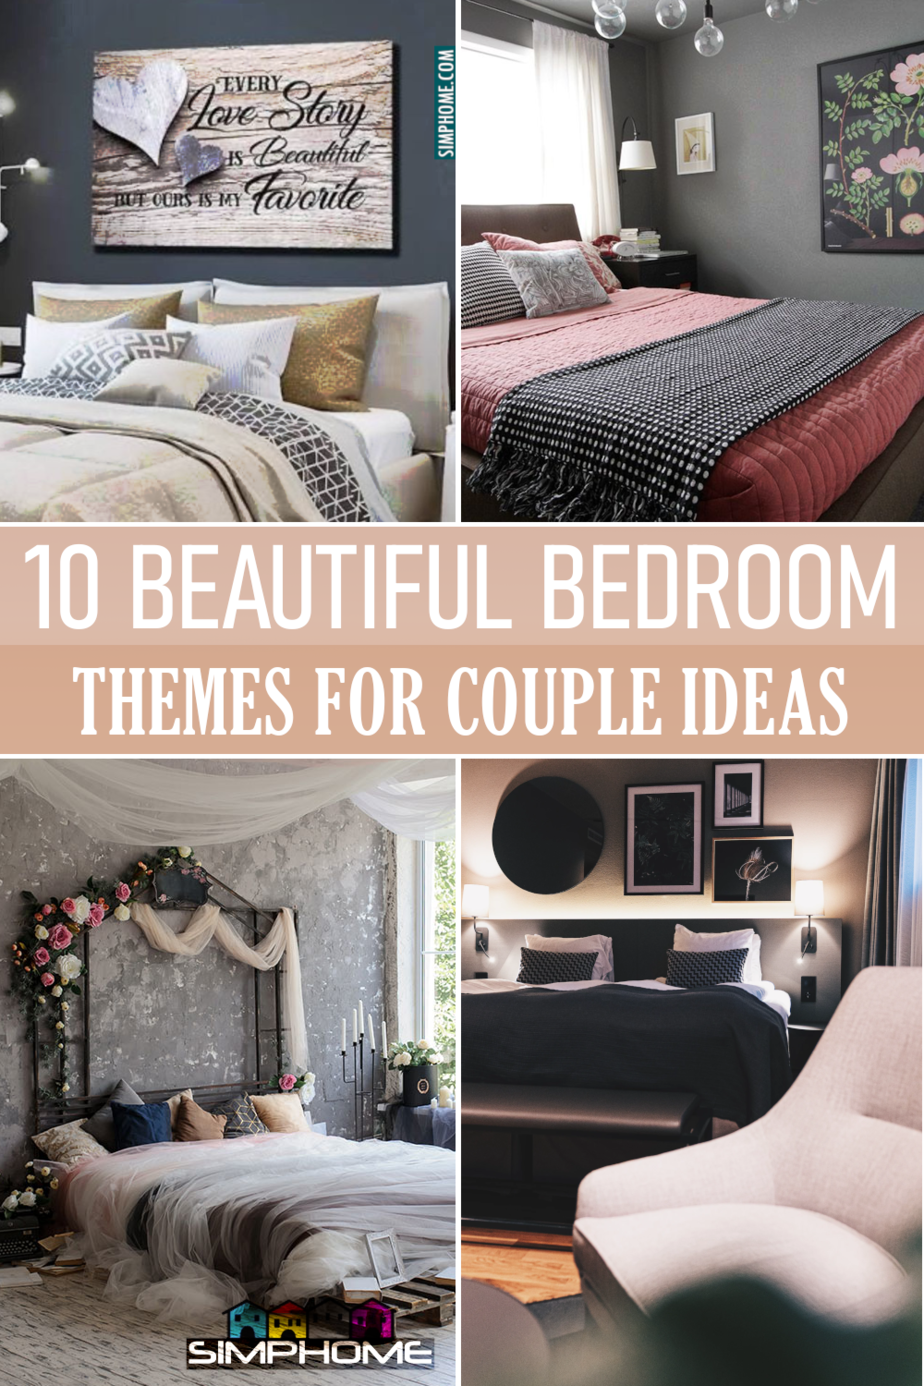 10 Beautiful themes for bedroom ideas via Simphome.com